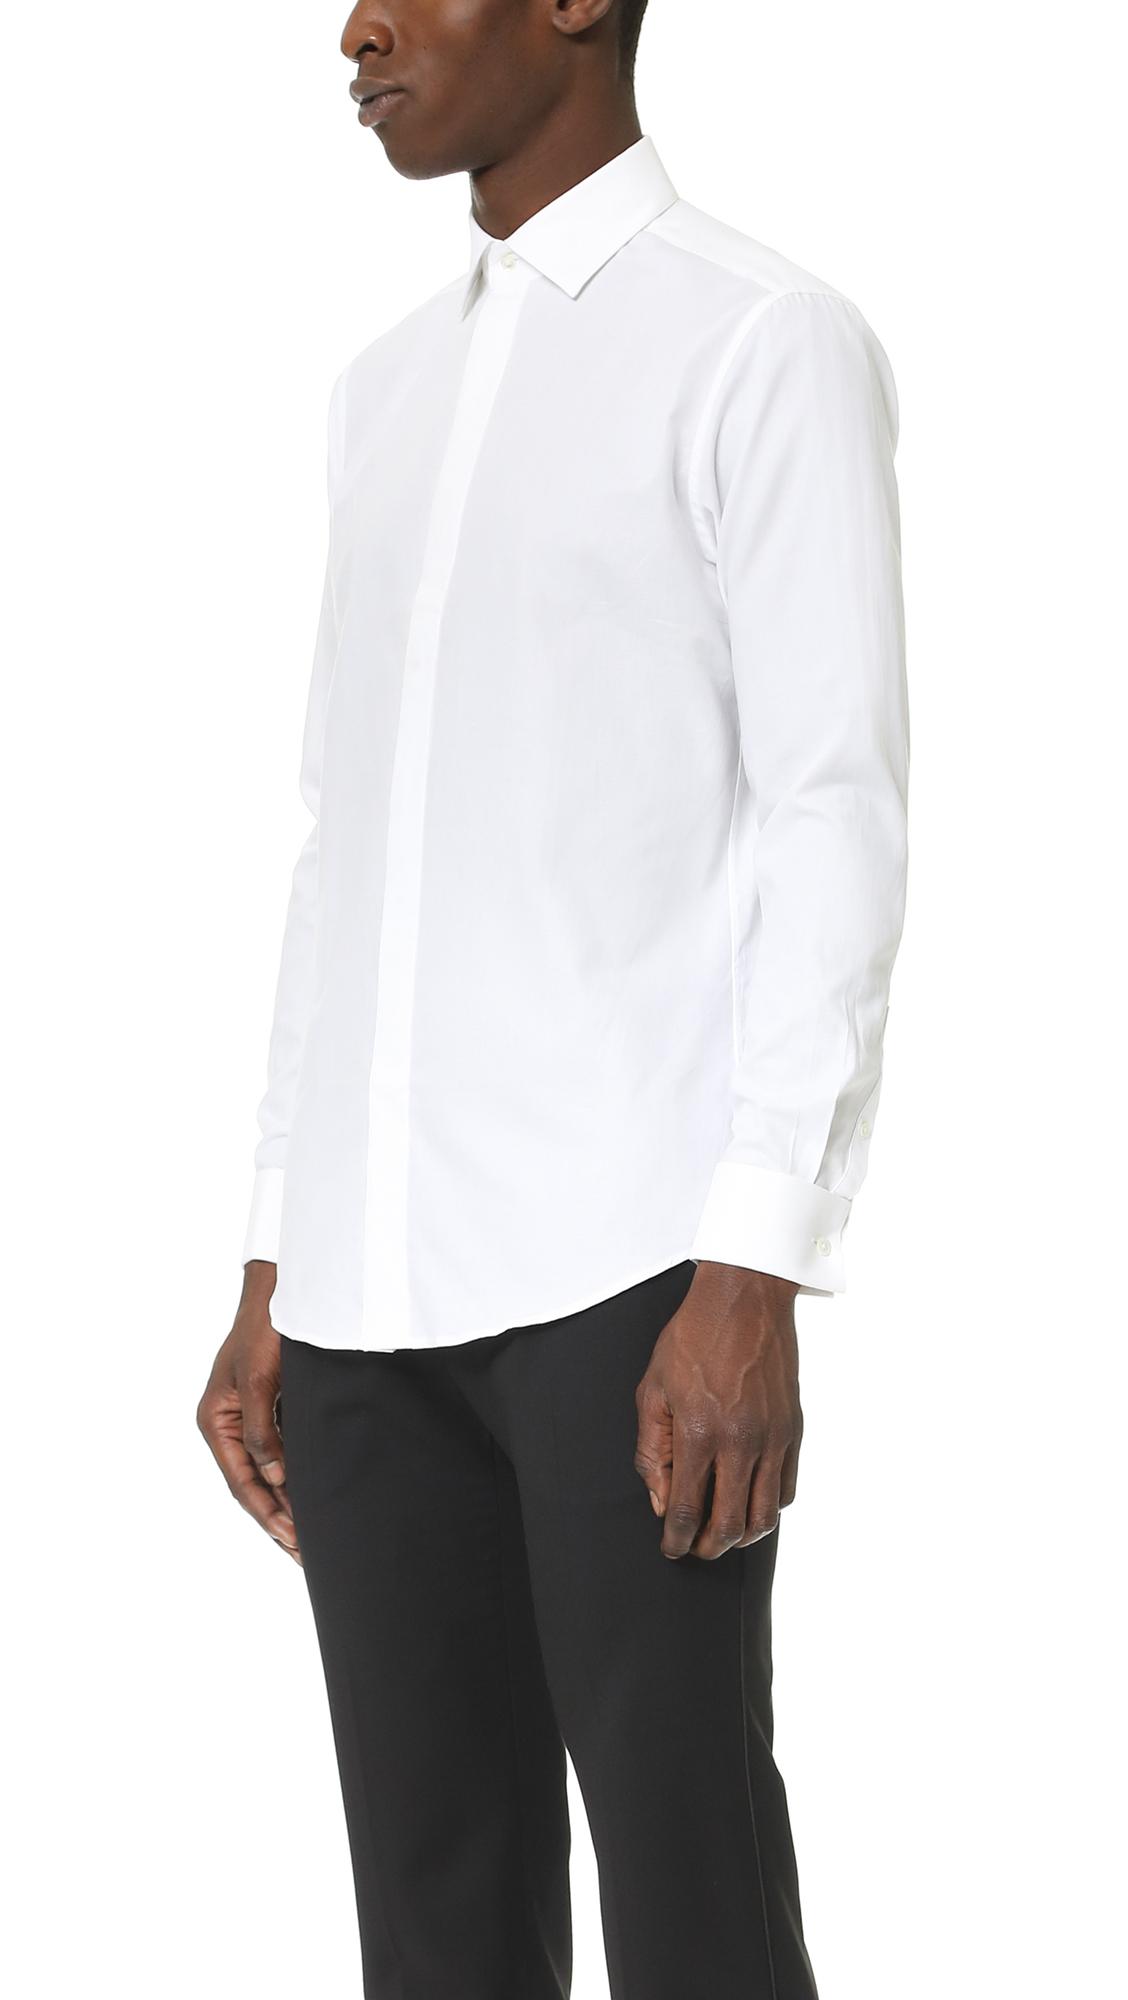 Theory sylvain wealth button down shirt slim fit white for Slim fit white button down shirt